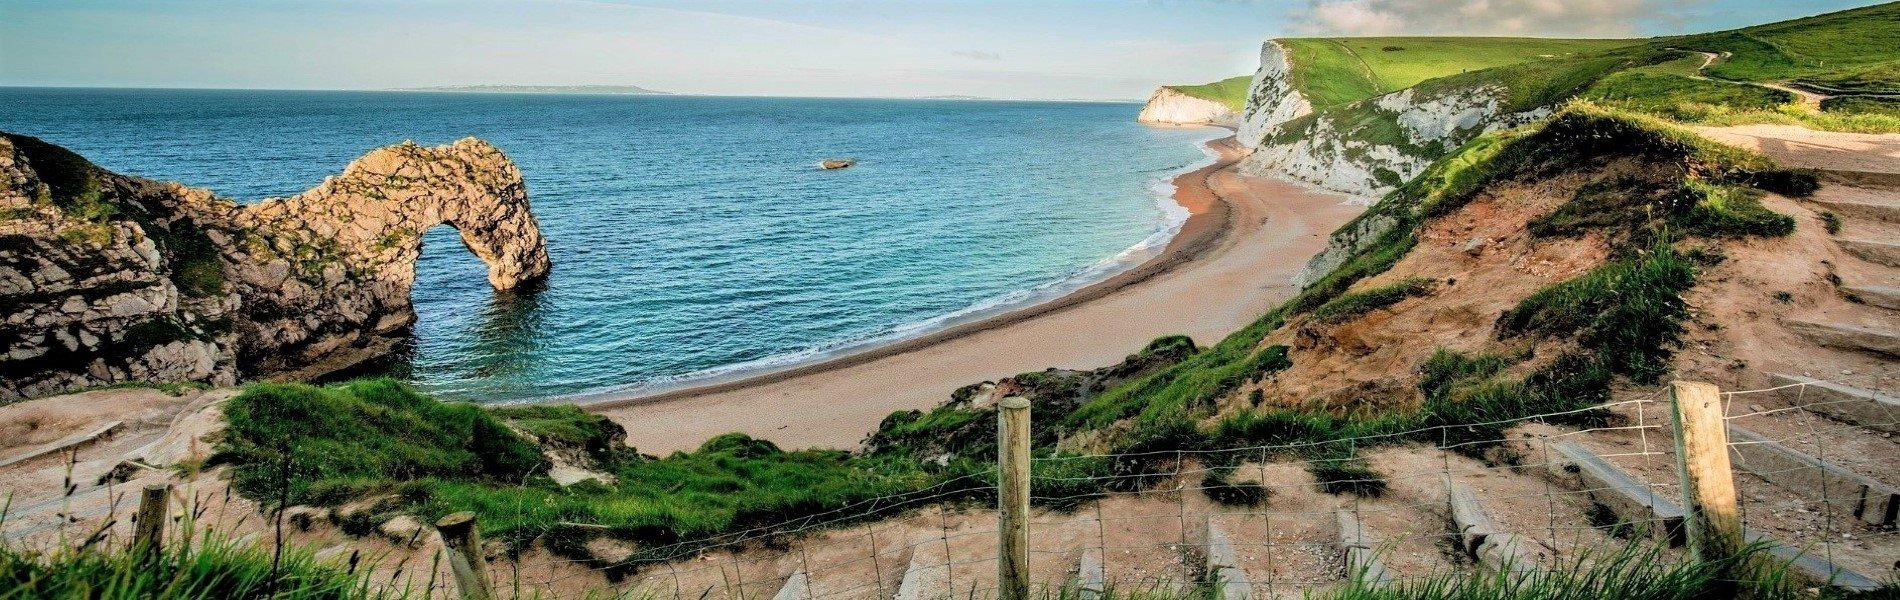 Jurassic Coast, Dorset, England